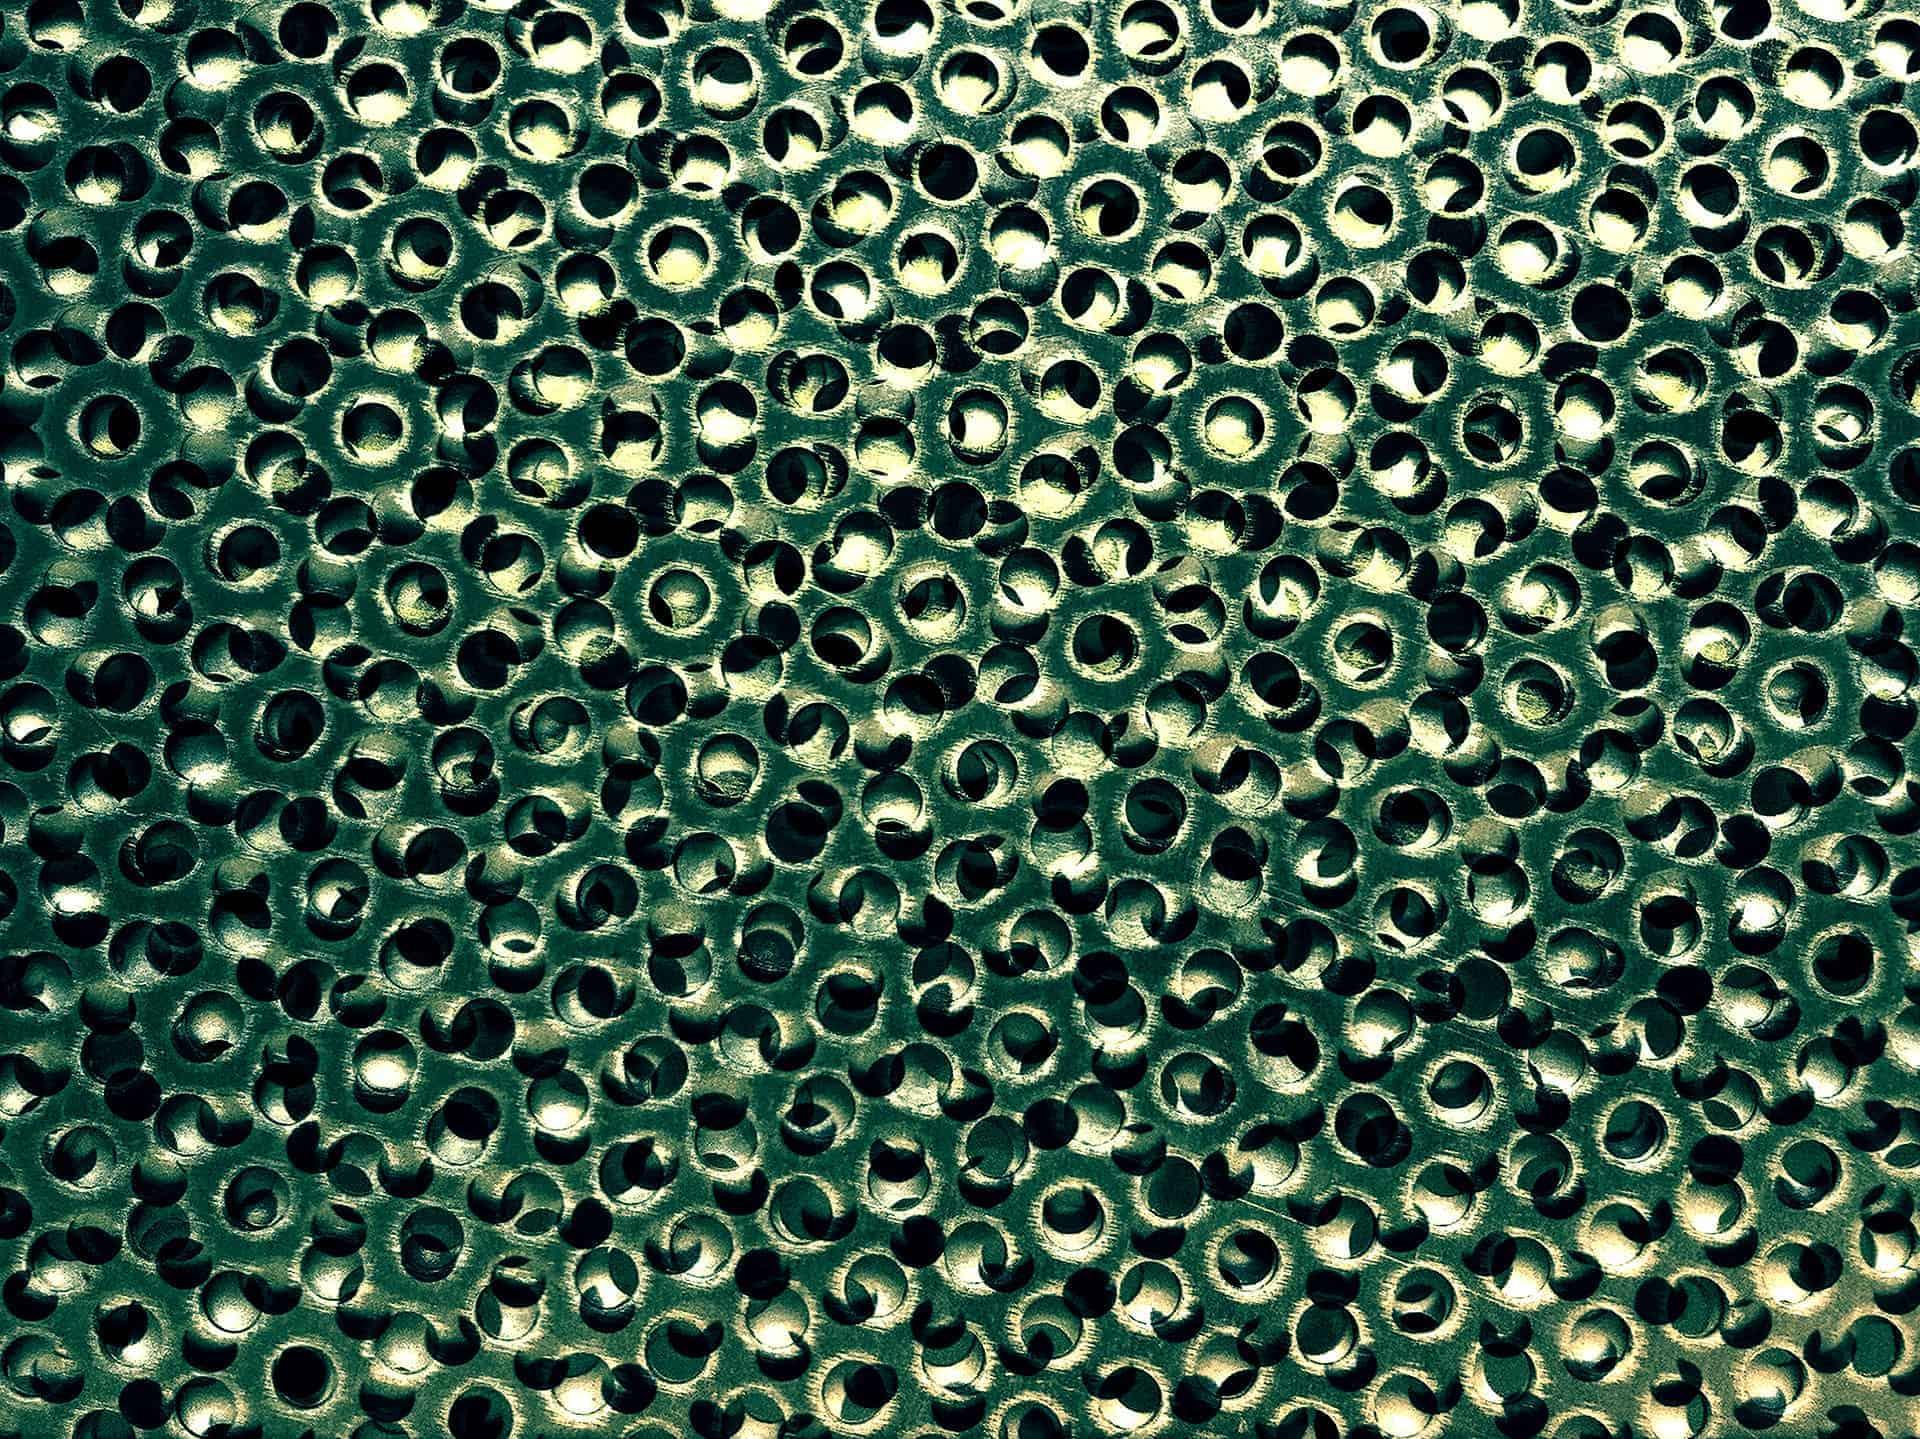 artnorama - Green Sieve